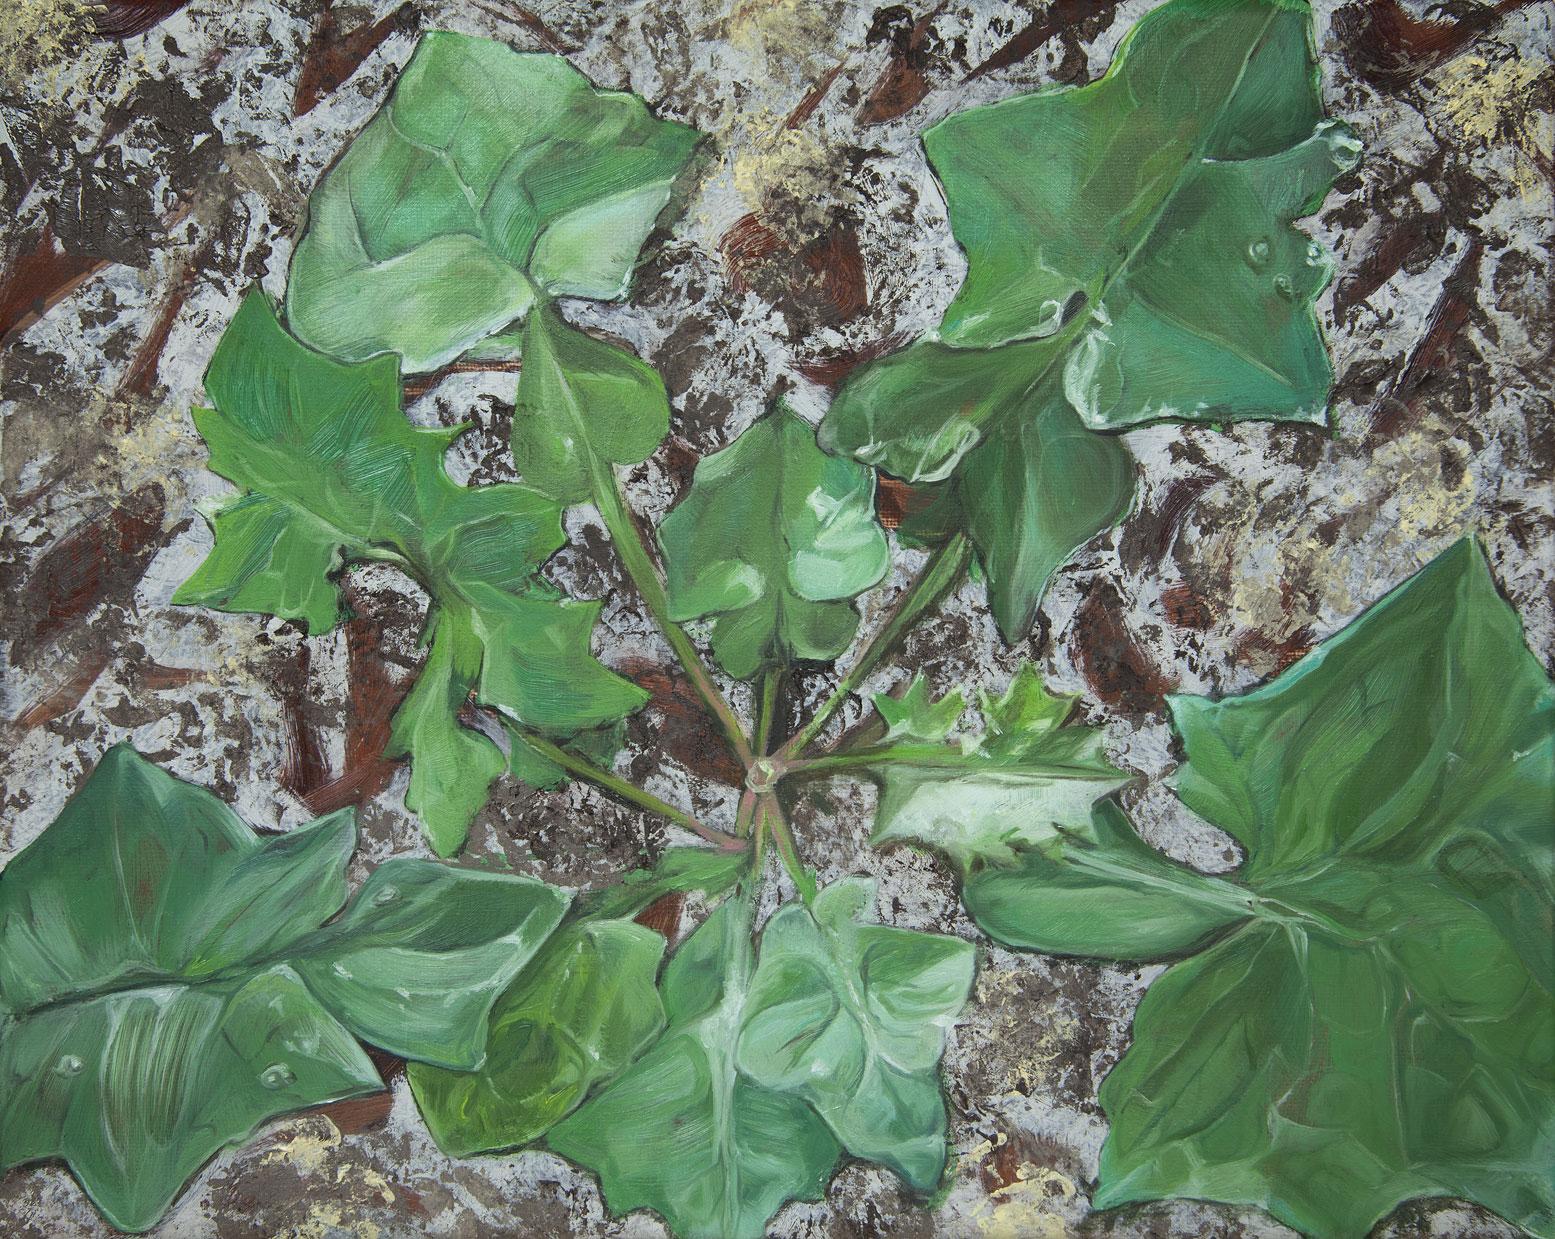 Bennie Reilly, Weed III, Botanic Gardens, Dublin, oil on canvas, 25x30cm